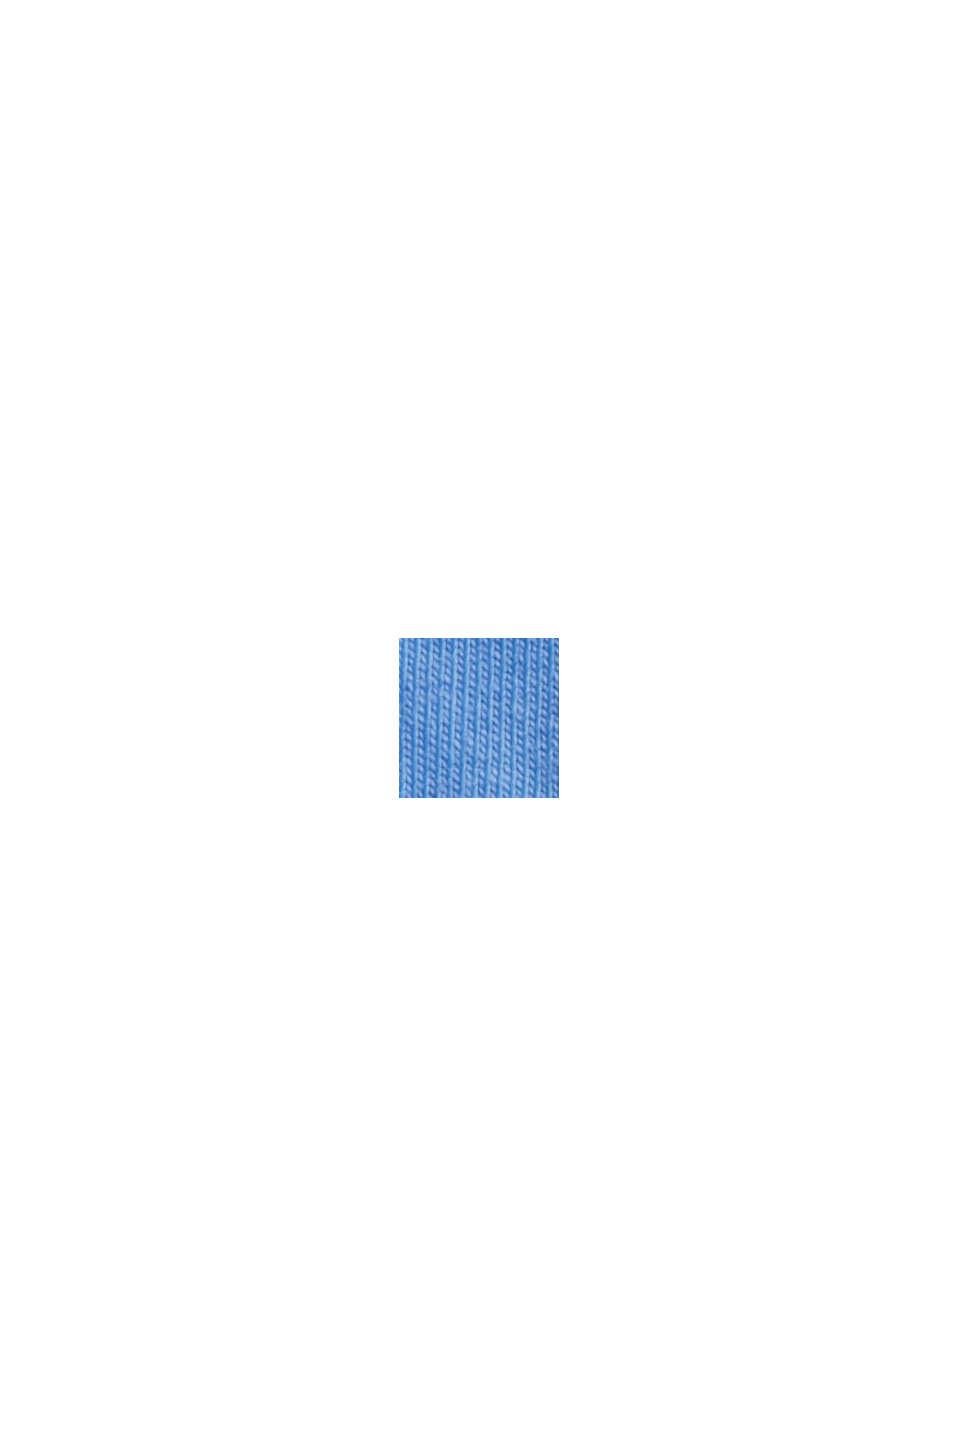 Langes Tanktop aus Organic Cotton, BRIGHT BLUE, swatch